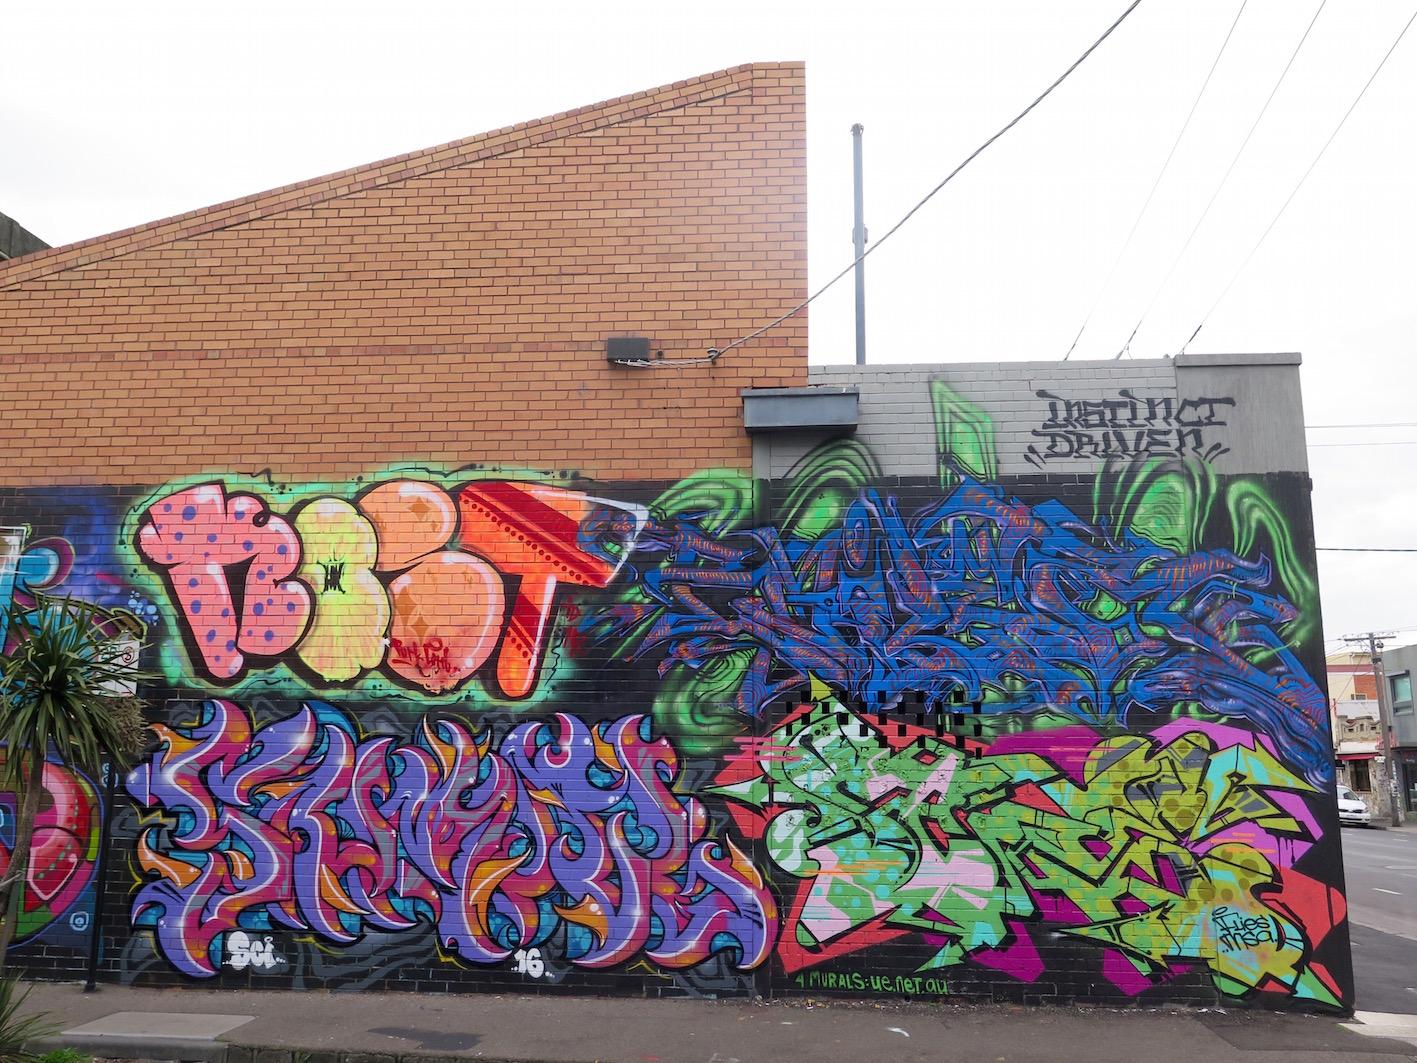 deansunshine_landofsunshine_melbourne_streetart_graffiti_ID crew brunswick 2